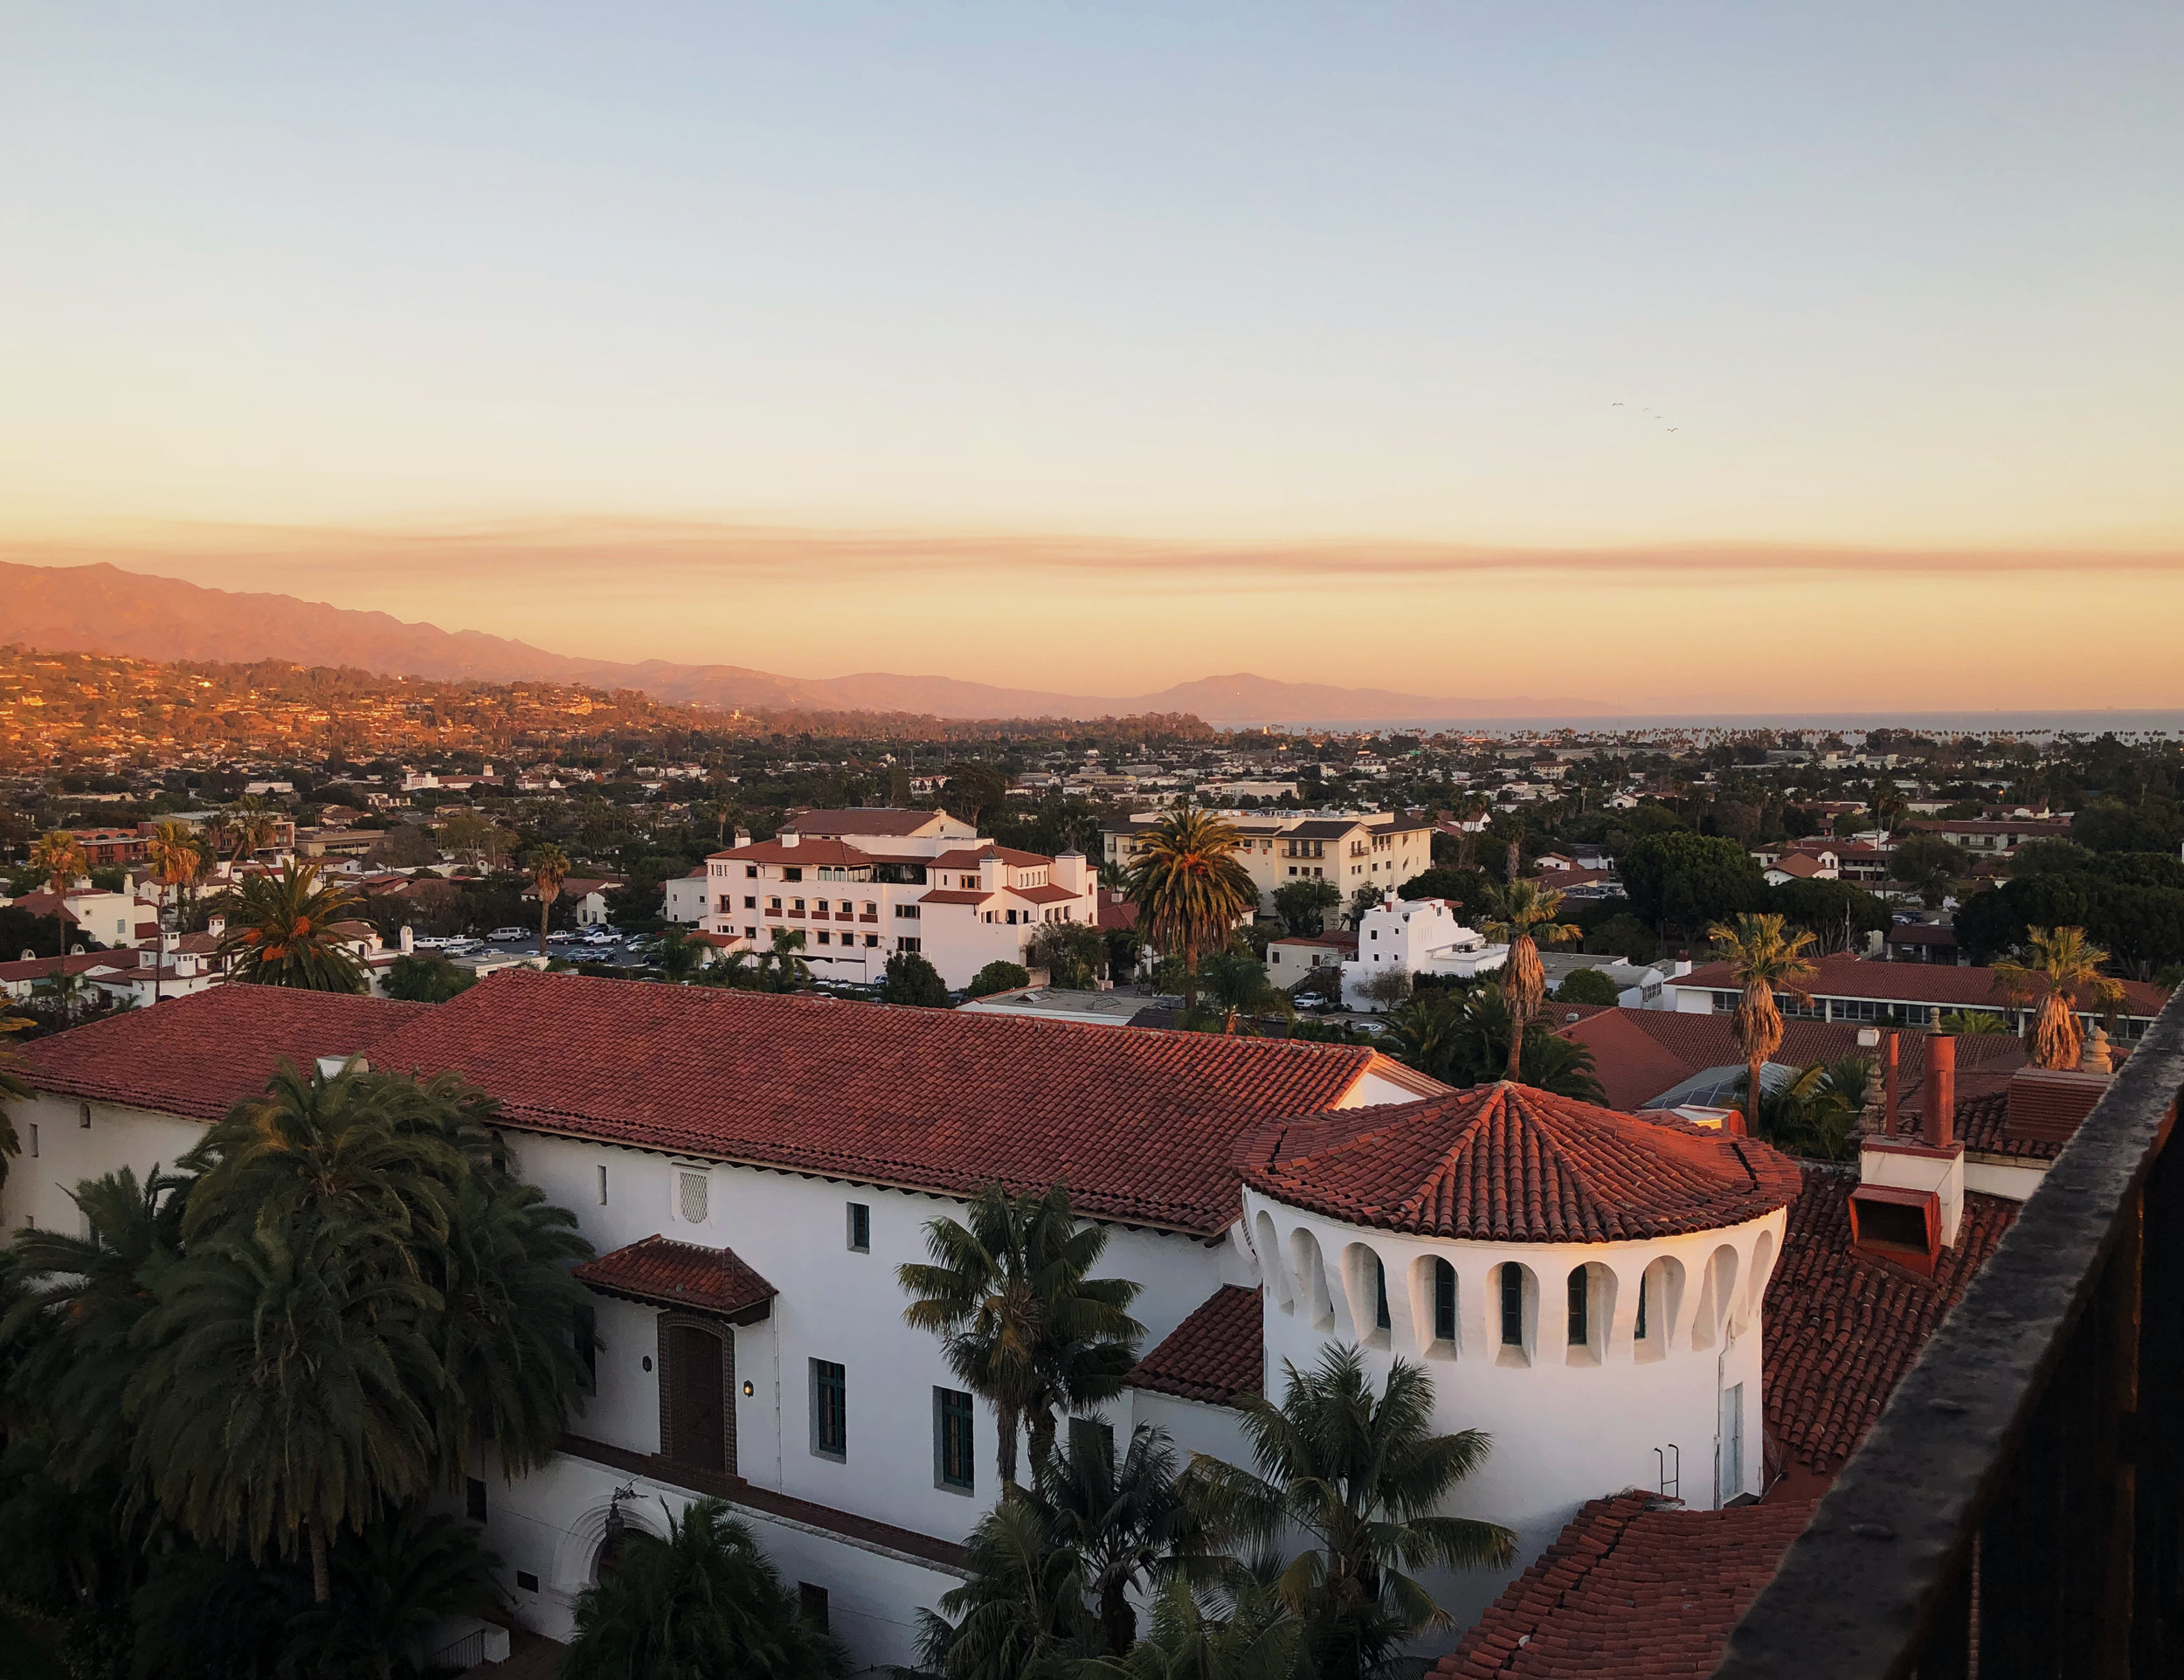 SANTA BARBARA TOUR (1 DAY) - Colleges: University of California Santa Barbara, Westmont College, Cal Sate San Luis ObispoCost: $298 (Early Bird); $349 (Regular)Next Tour: TBA